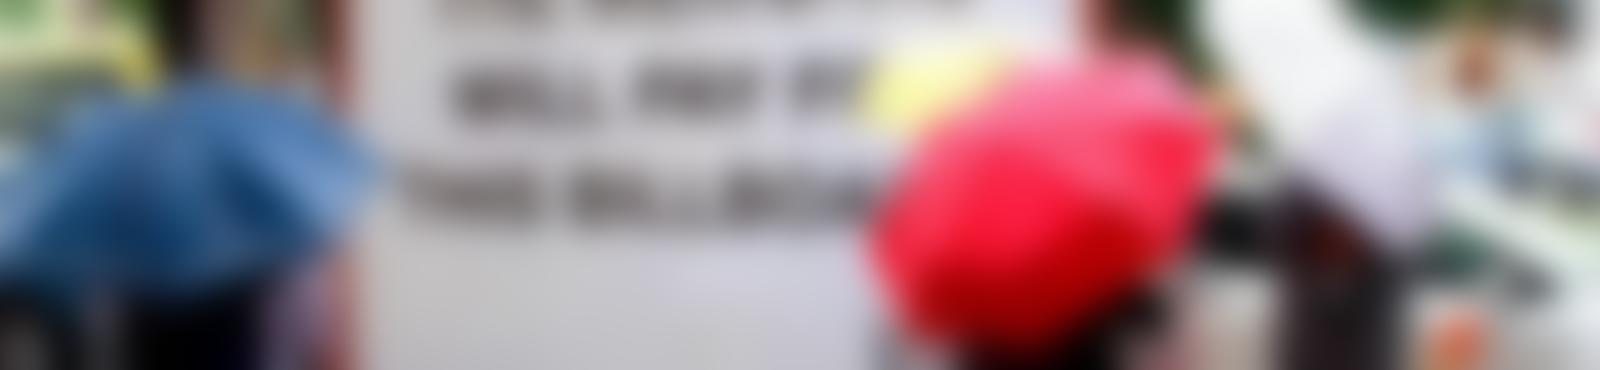 Blurred 4f2eecd0 989e 4474 b079 a6fc51158e3f